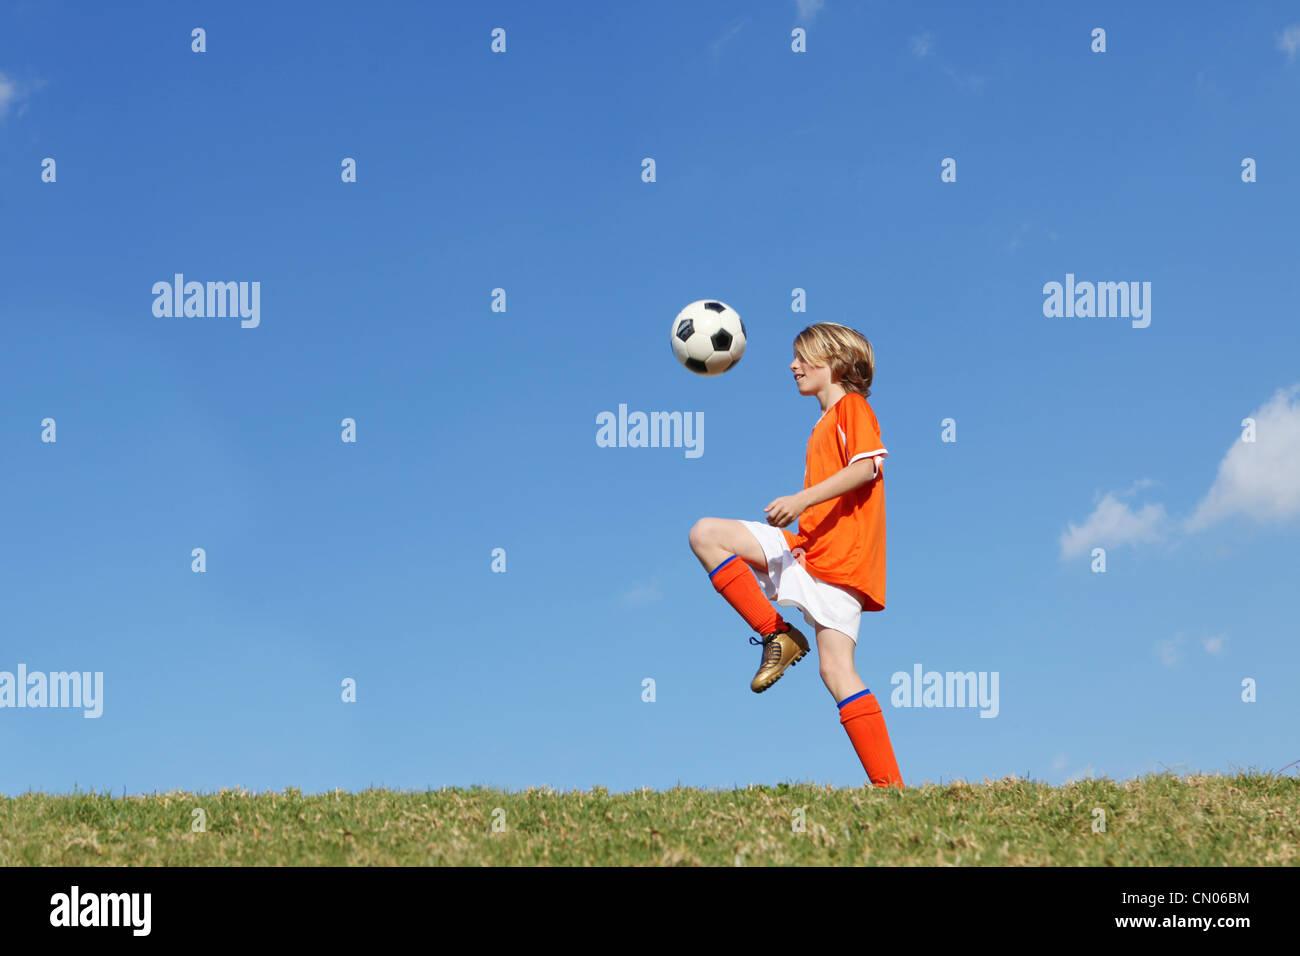 boy kid playing soccer kicking football stock photo royalty free